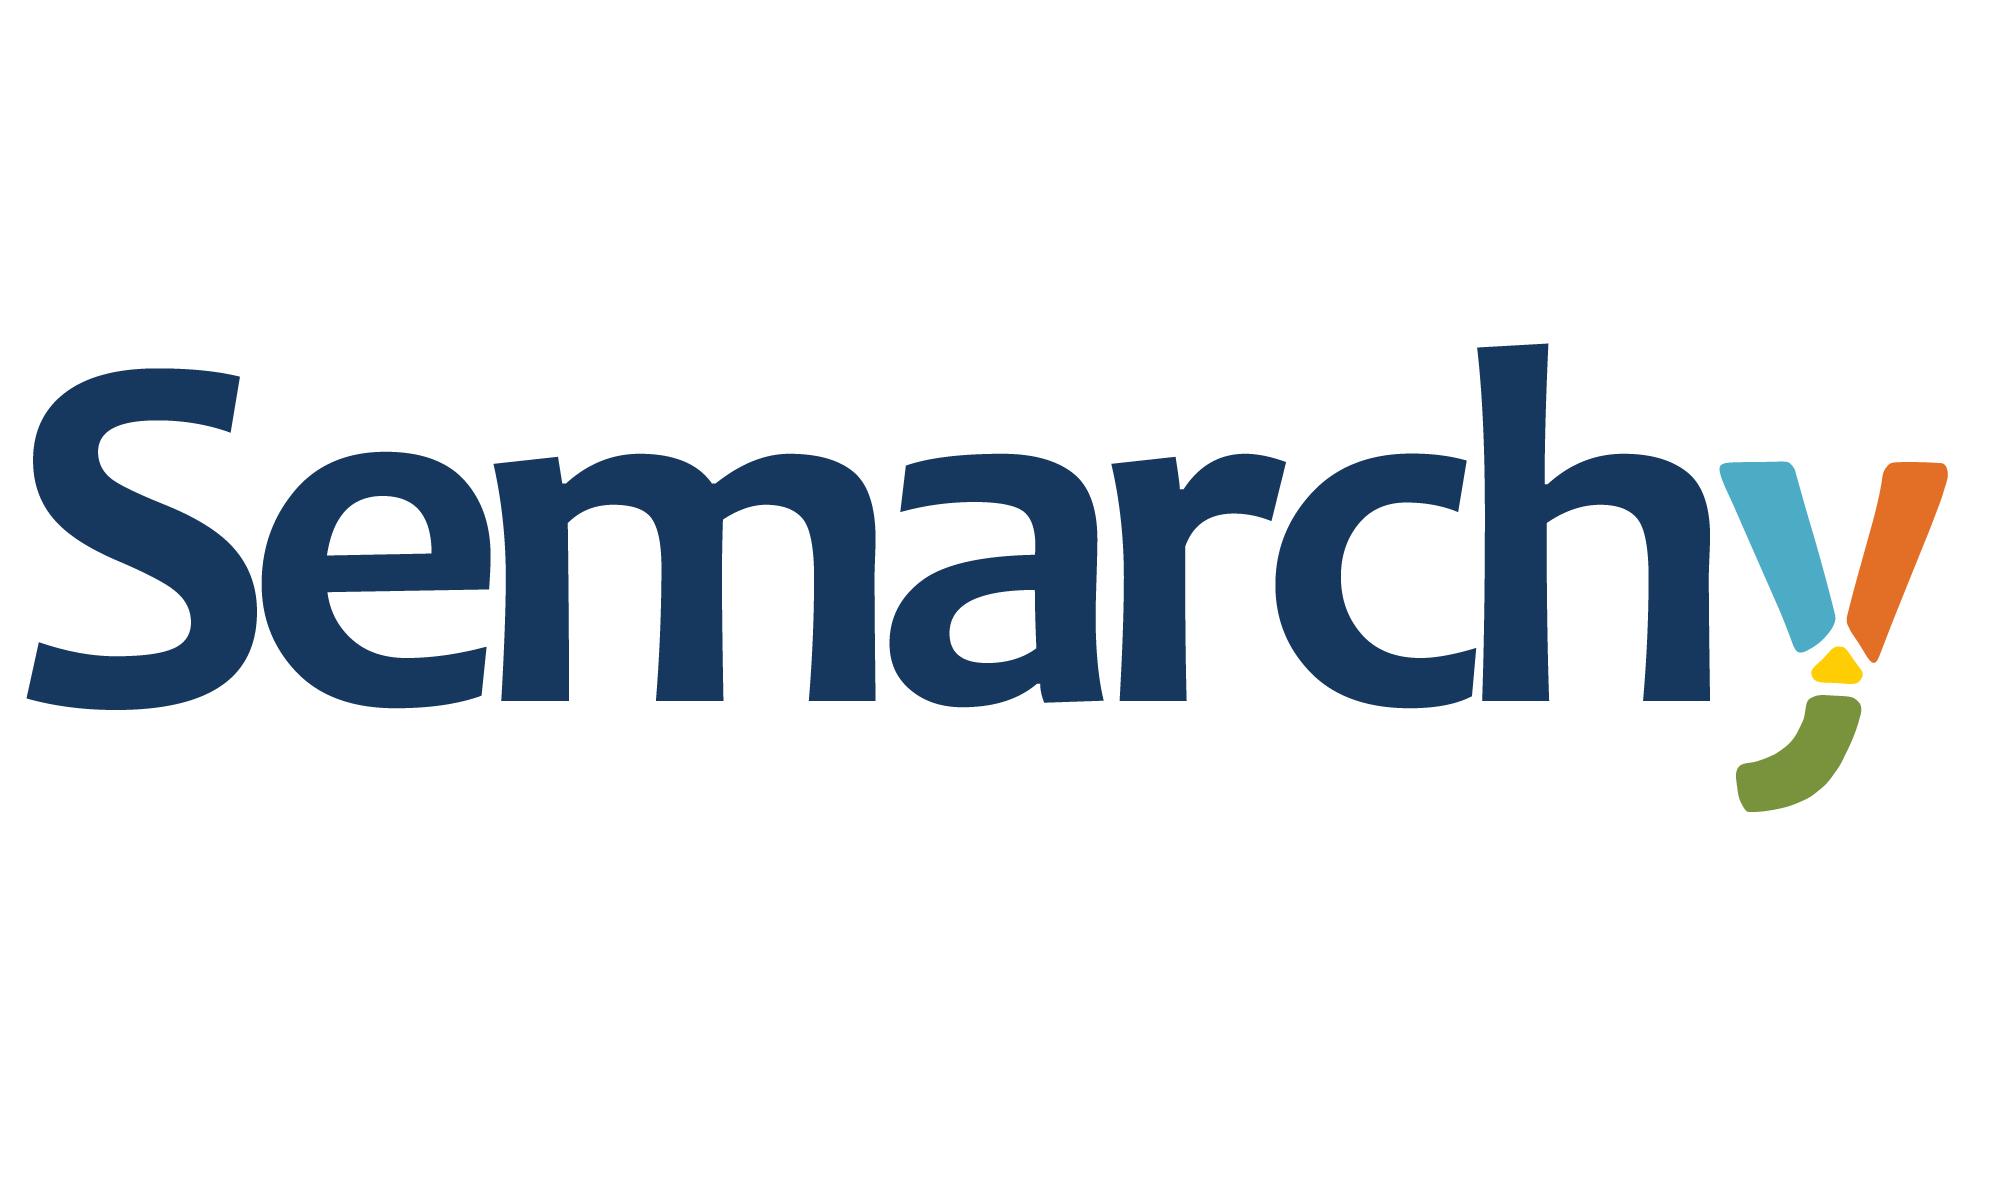 semarchy